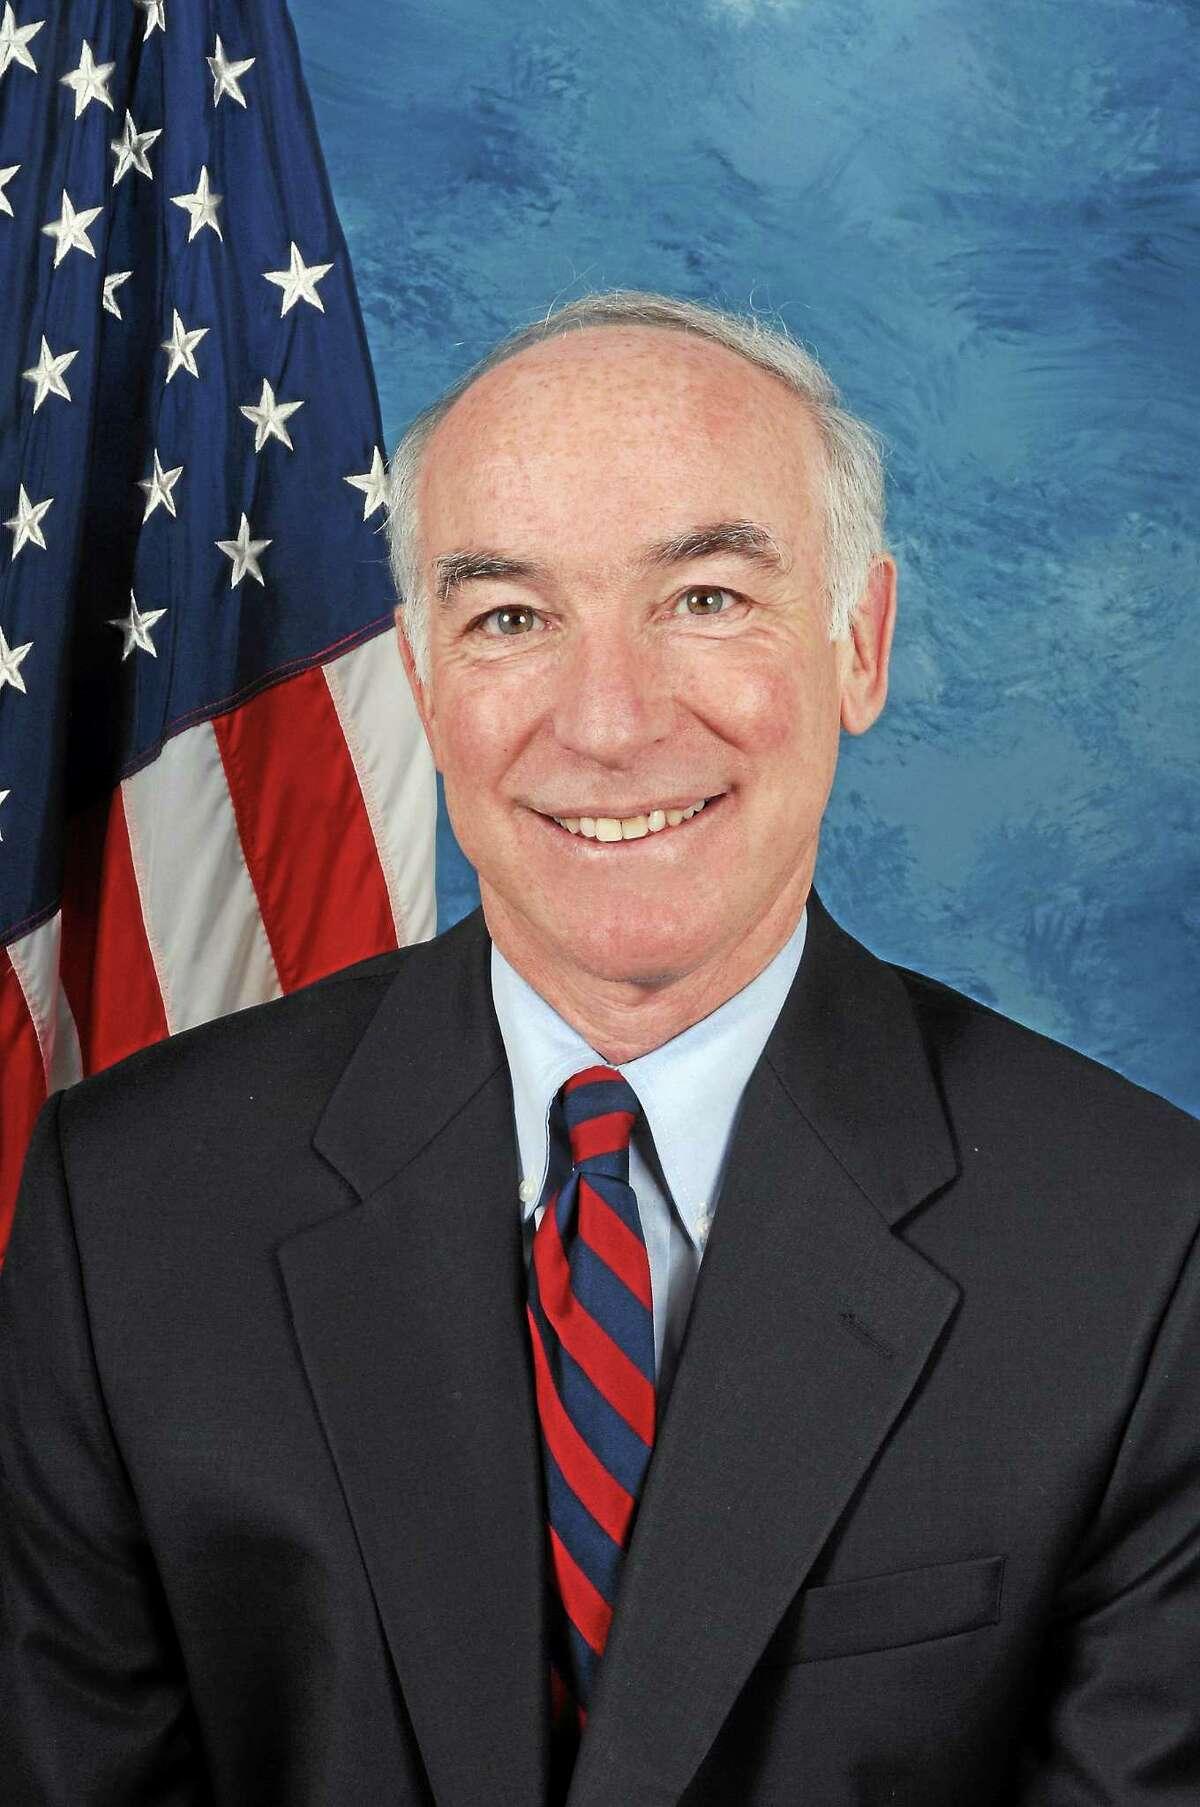 Democratic incumbent U.S. Rep. Joe Courtney